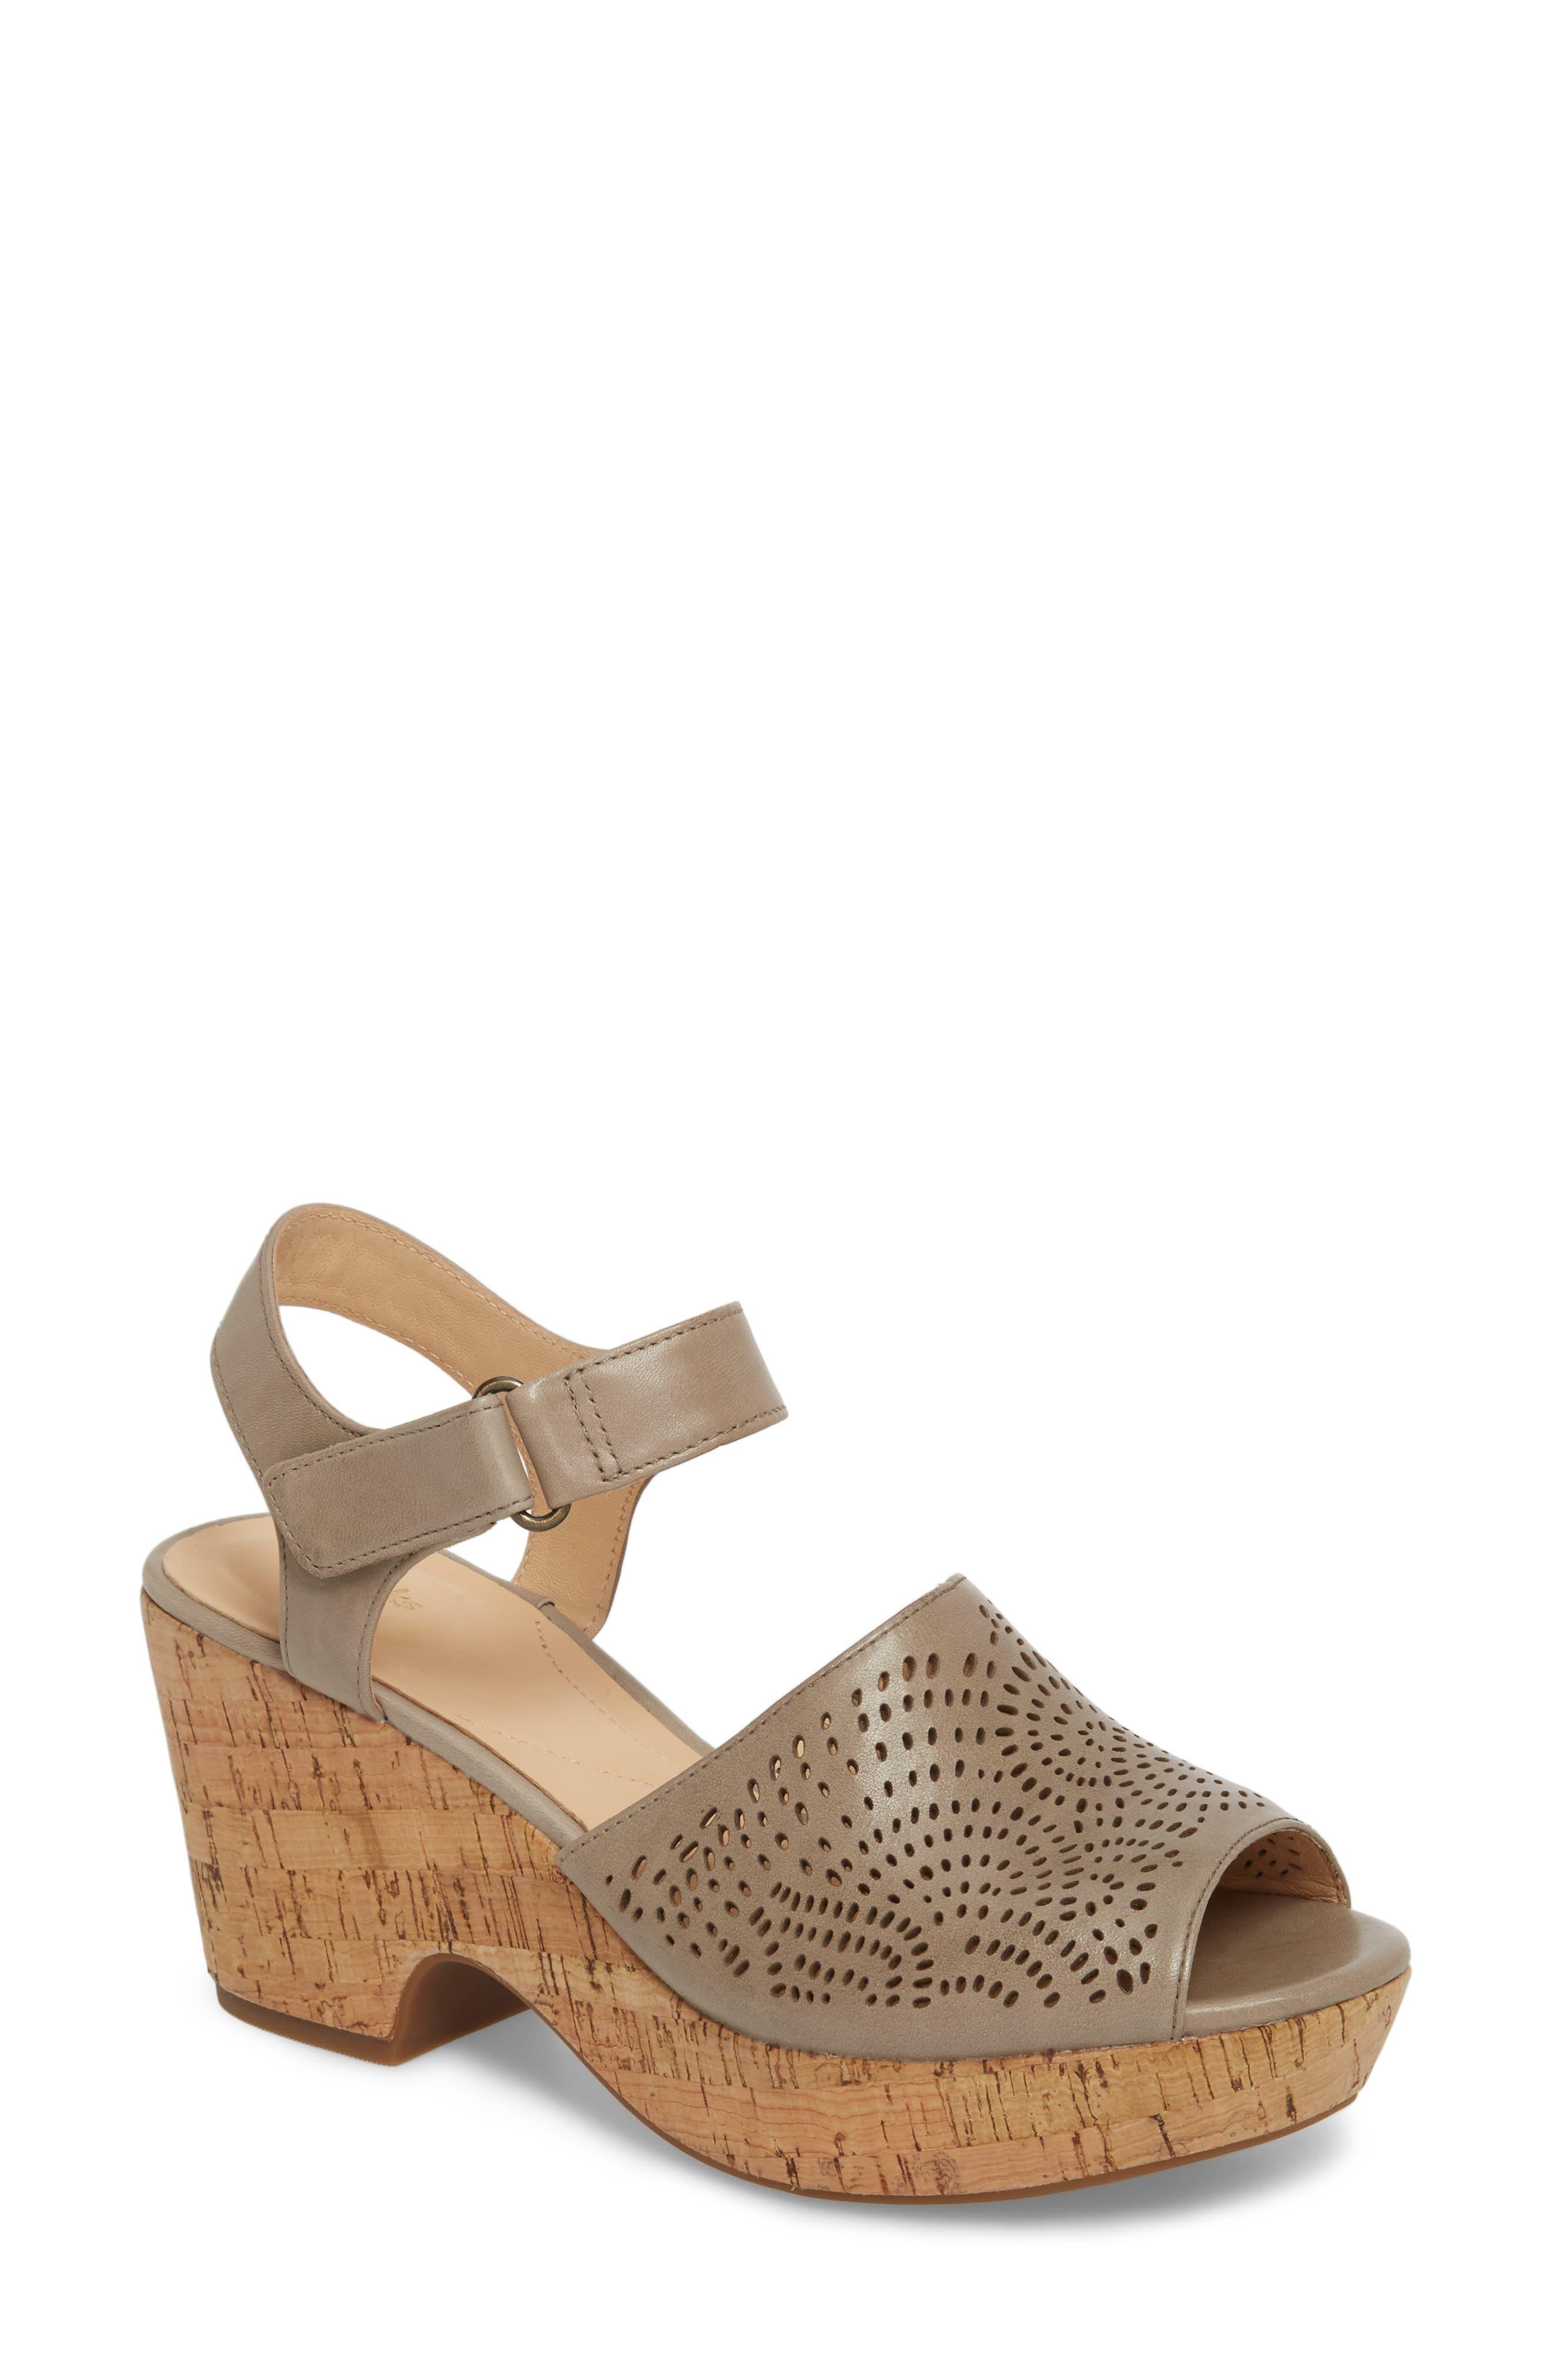 Main Image - Clarks® Maritsa Nila Platform Sandal (Women)